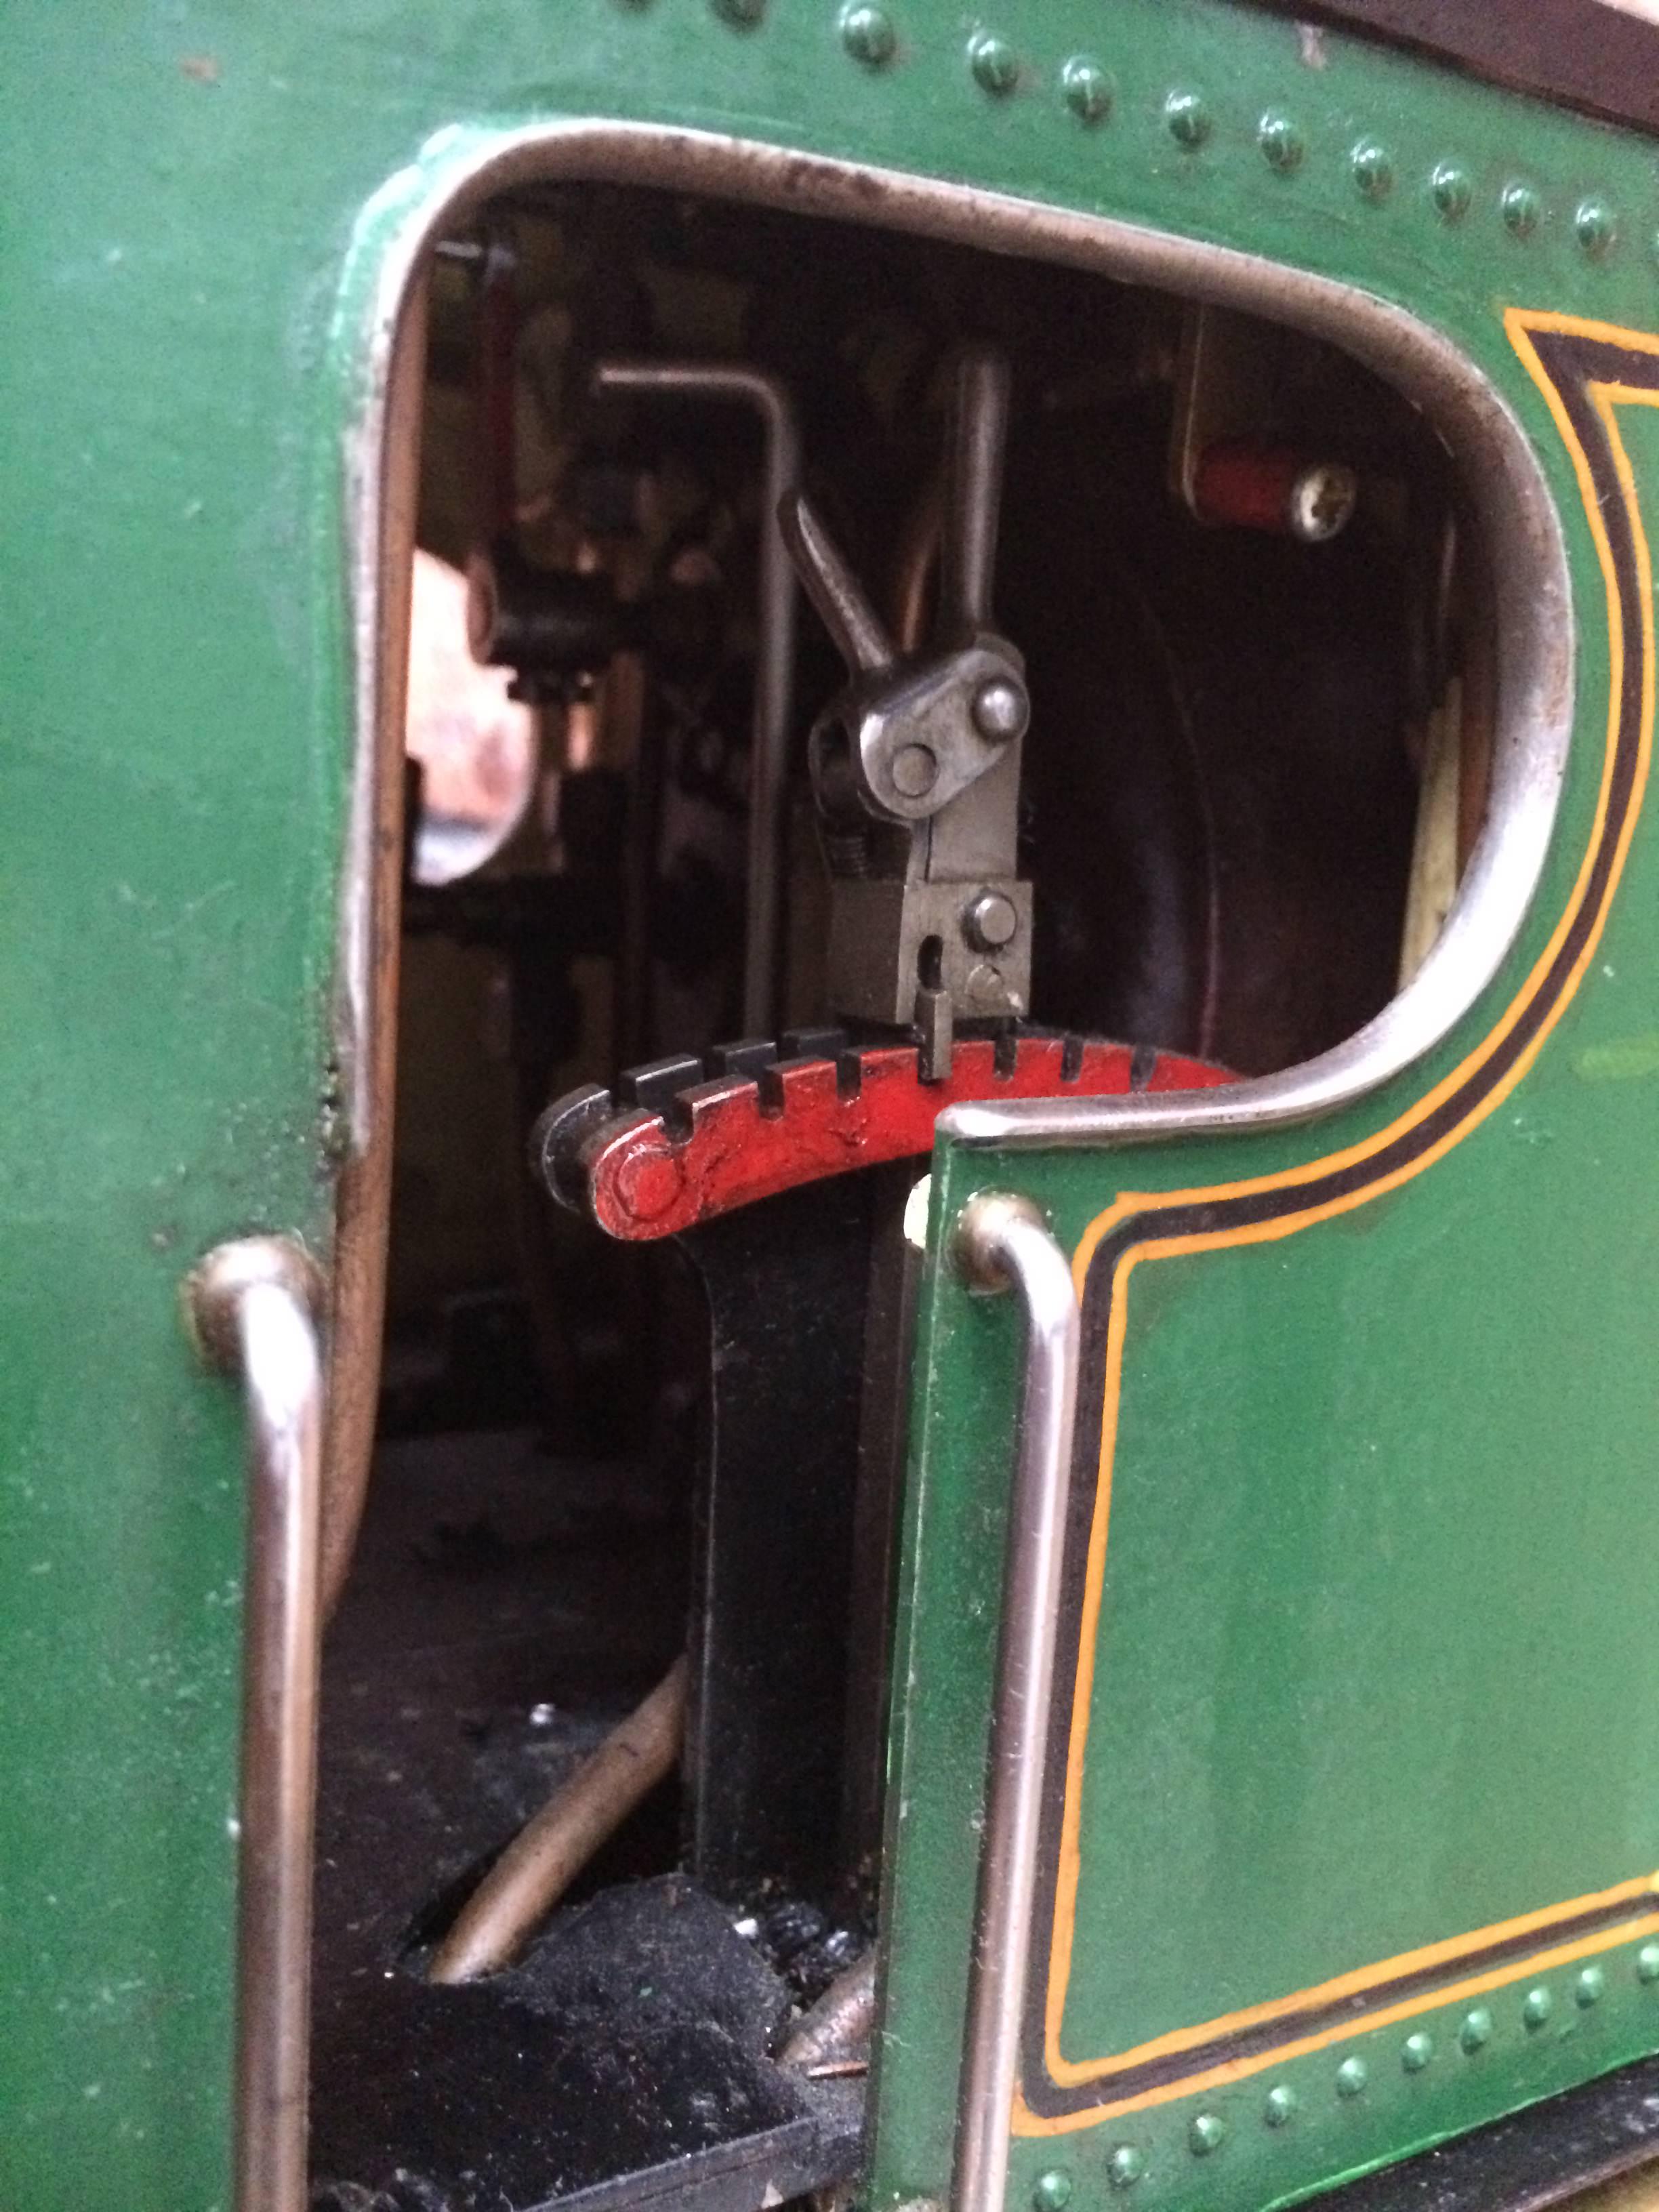 test 3 inch gauge freelance live steam tank engine for sale 12